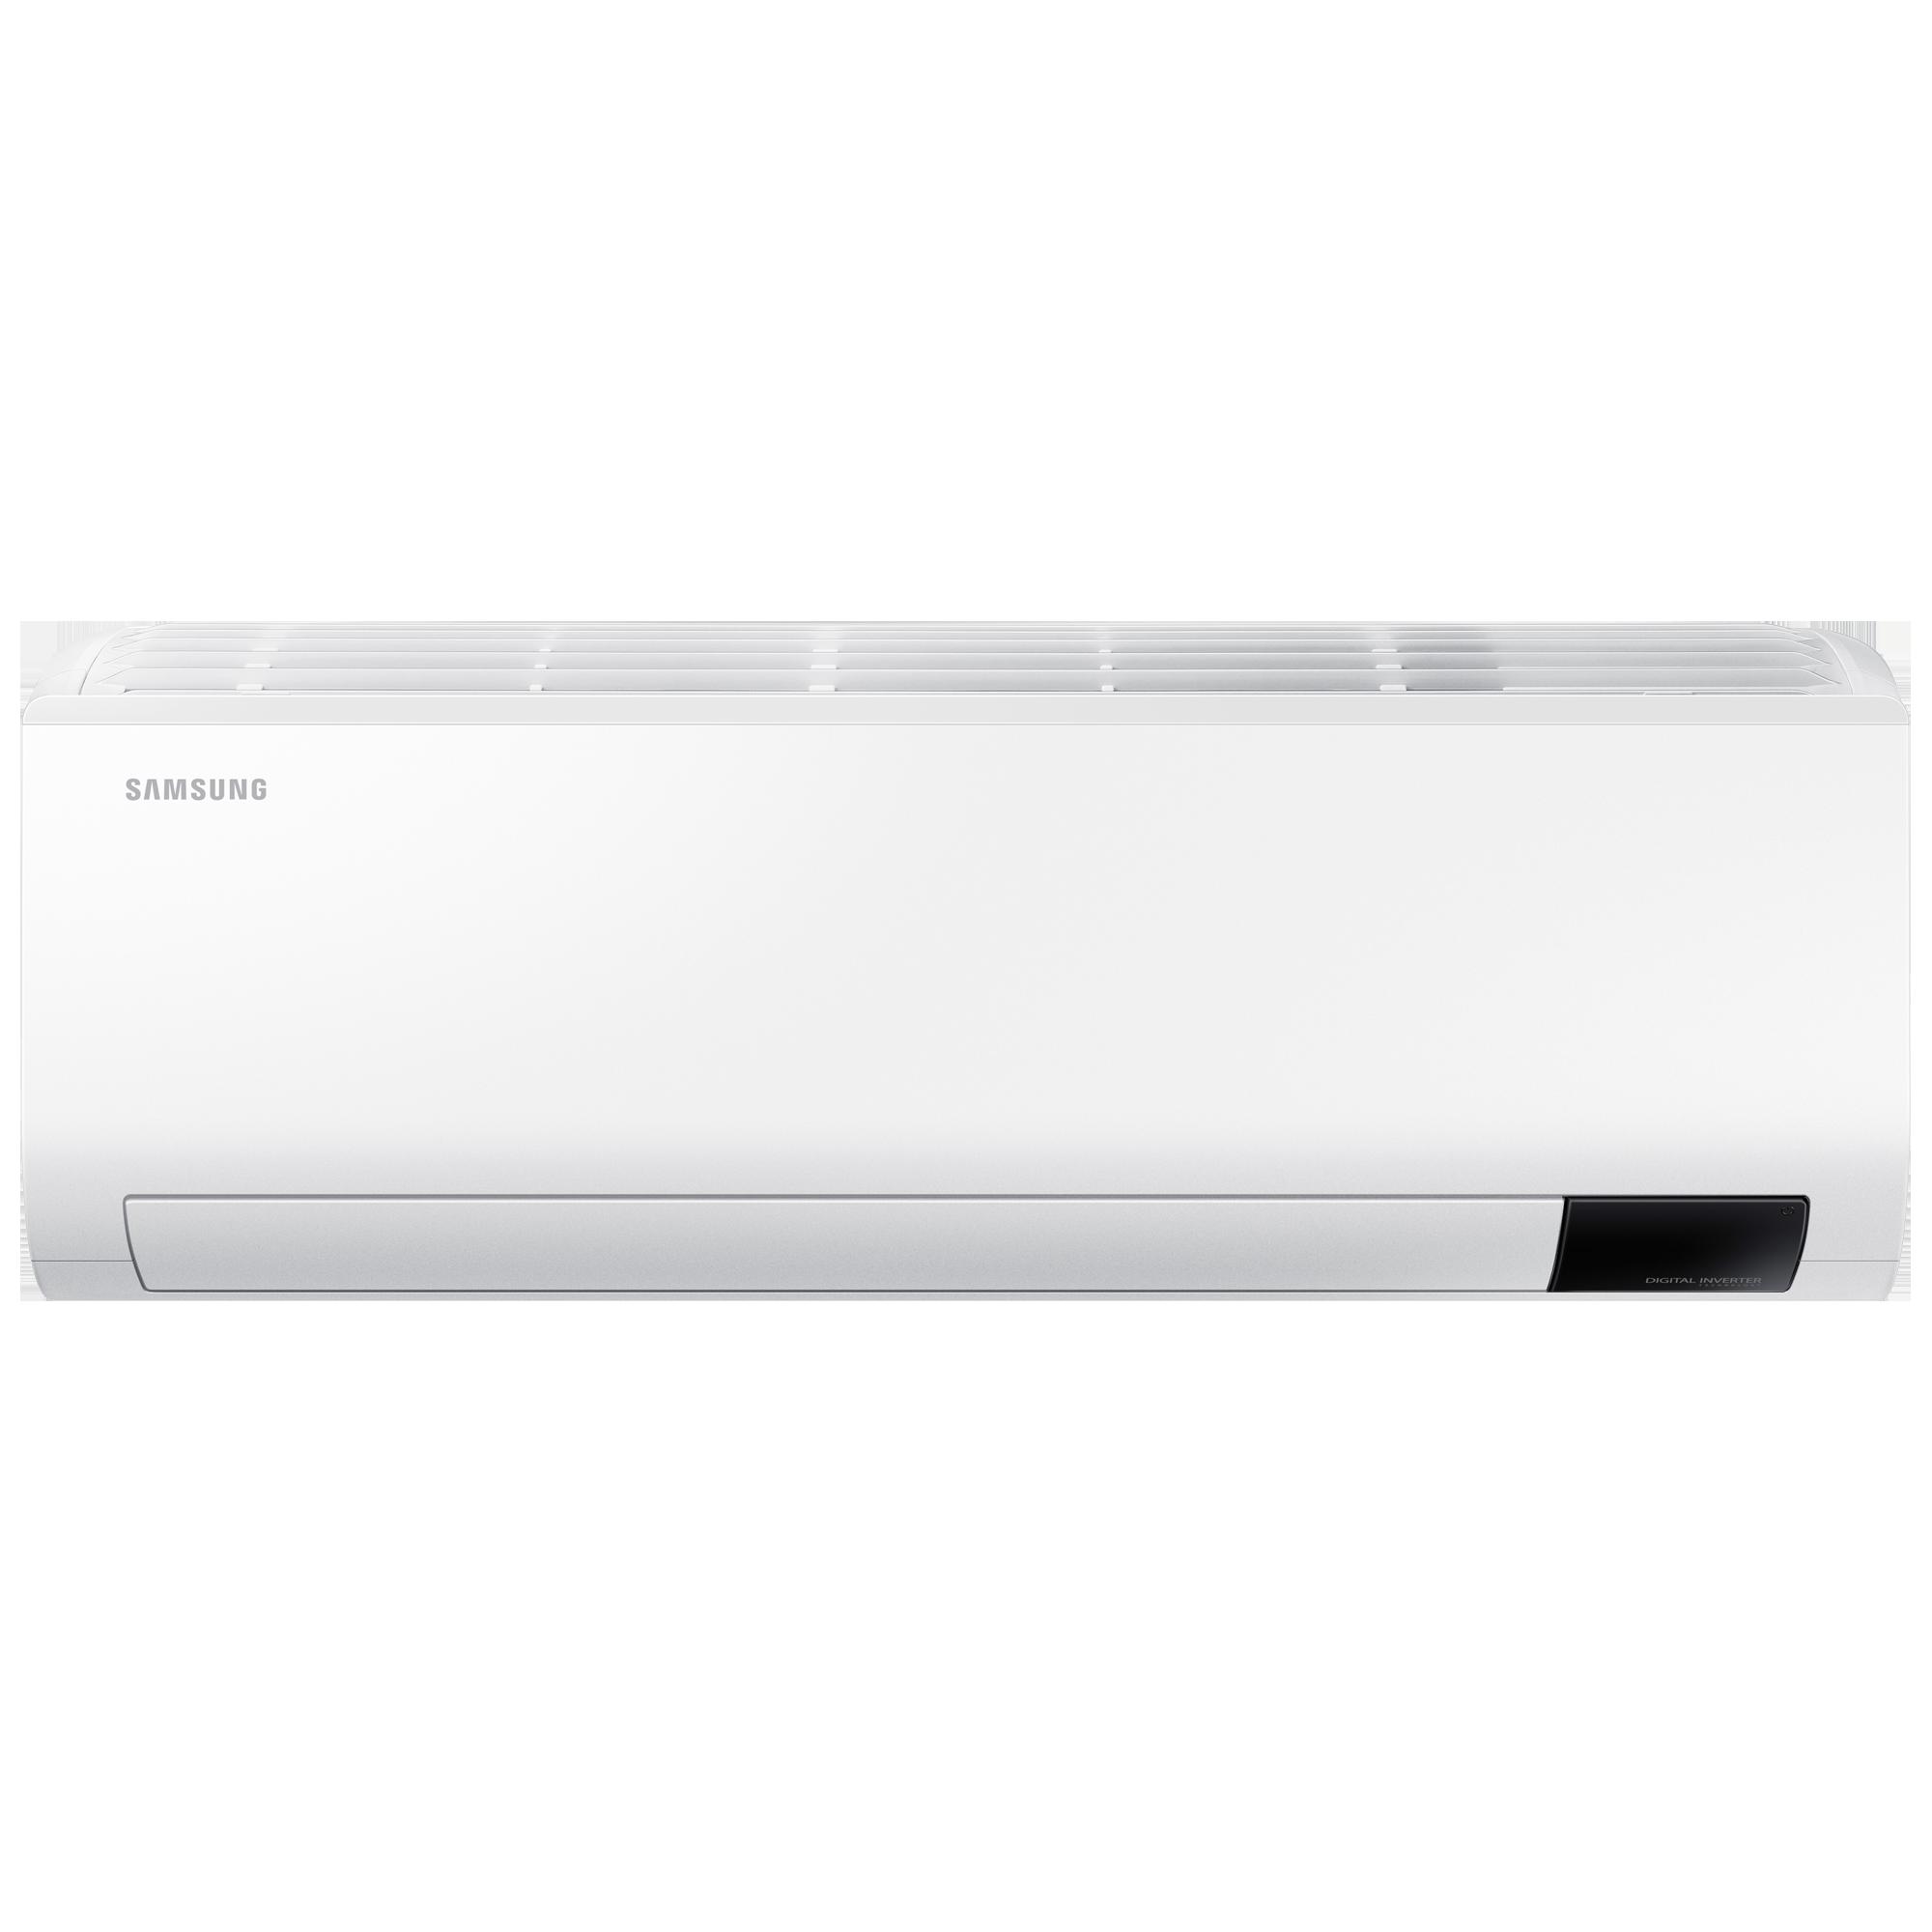 Samsung Airise 1 Ton 4 Star Inverter Split AC (Copper Condenser, AR12AY4ZAWK, White)_1